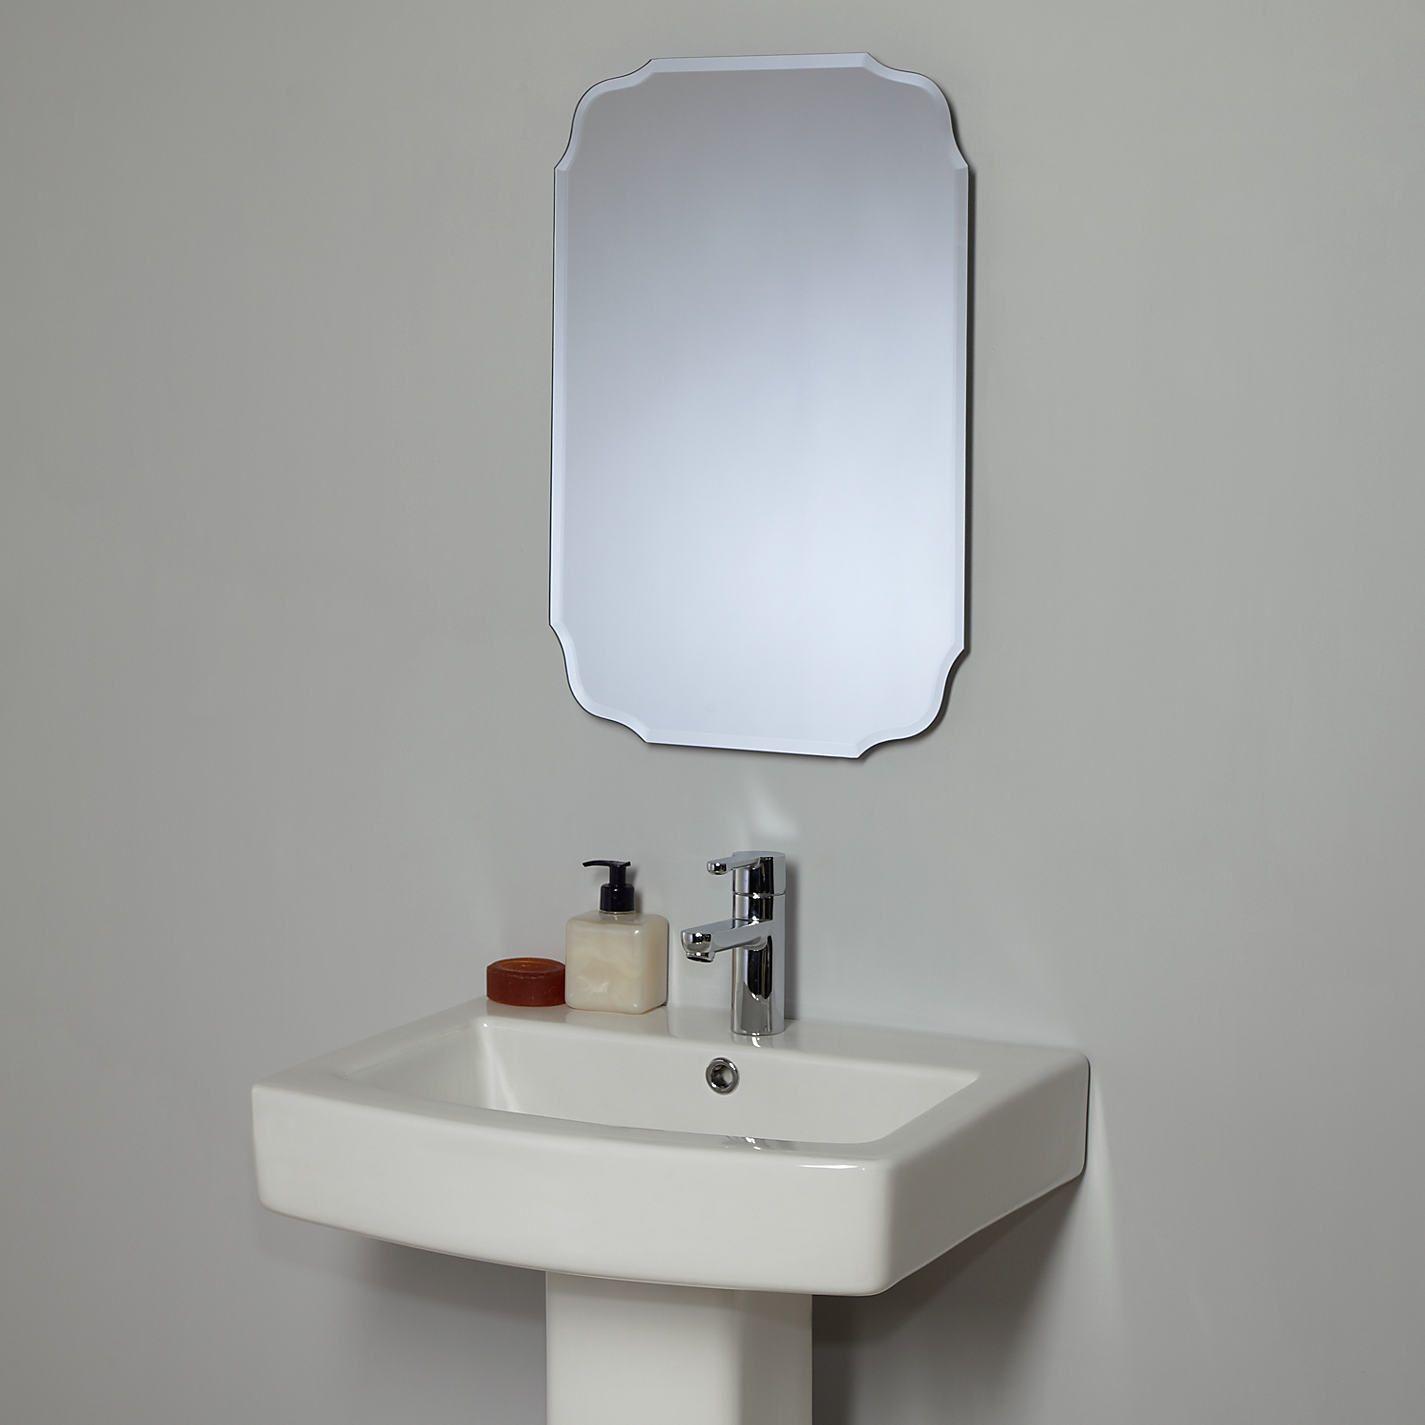 Bathroom Decorative Bathroom Mirror With Each Section End